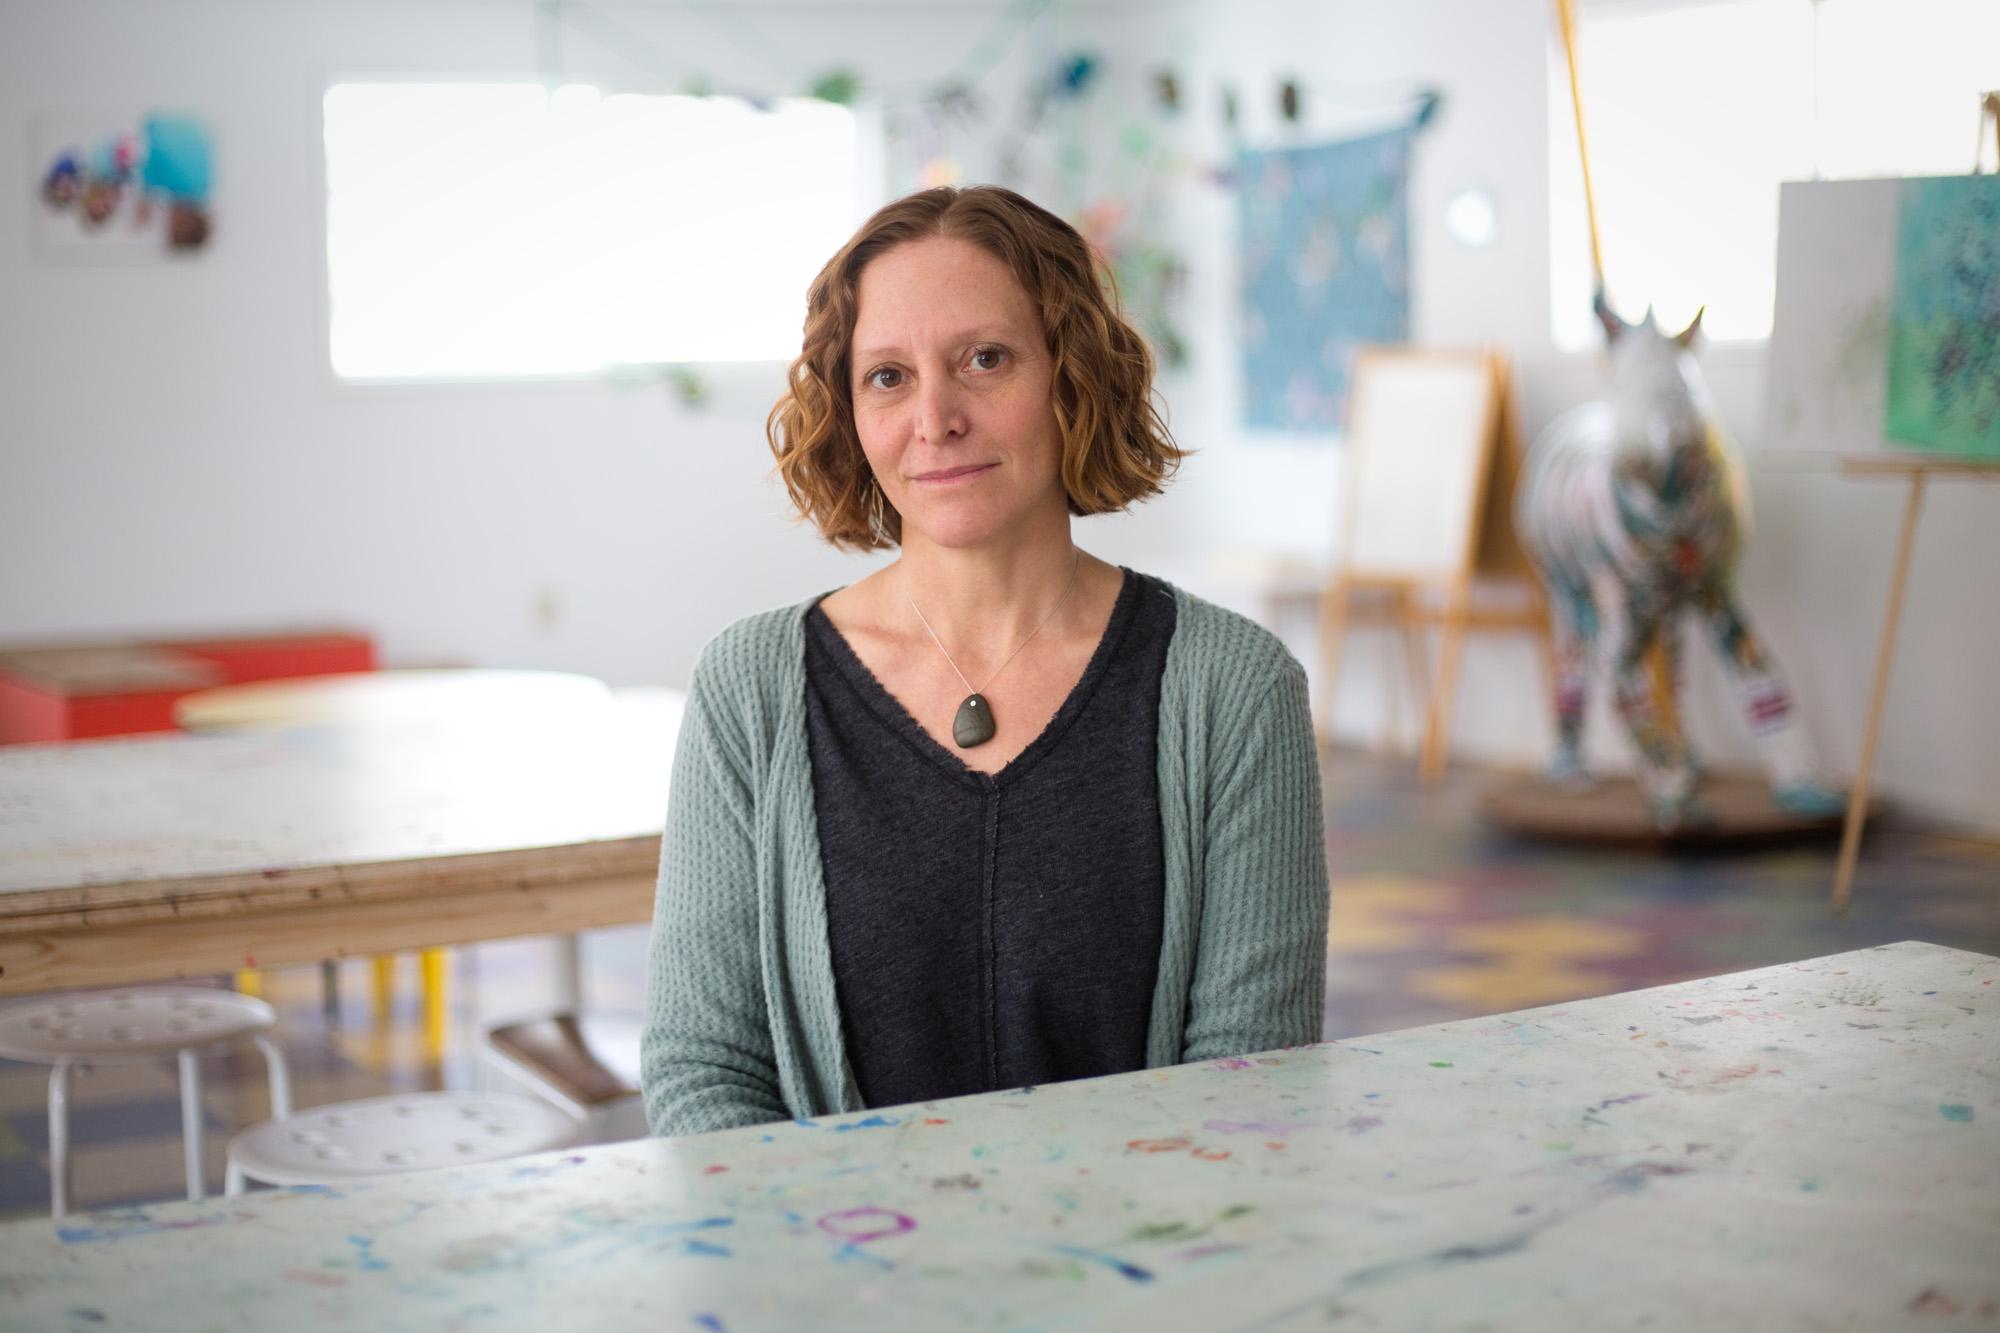 Darlene Becker, 43, at Base Camp Studio